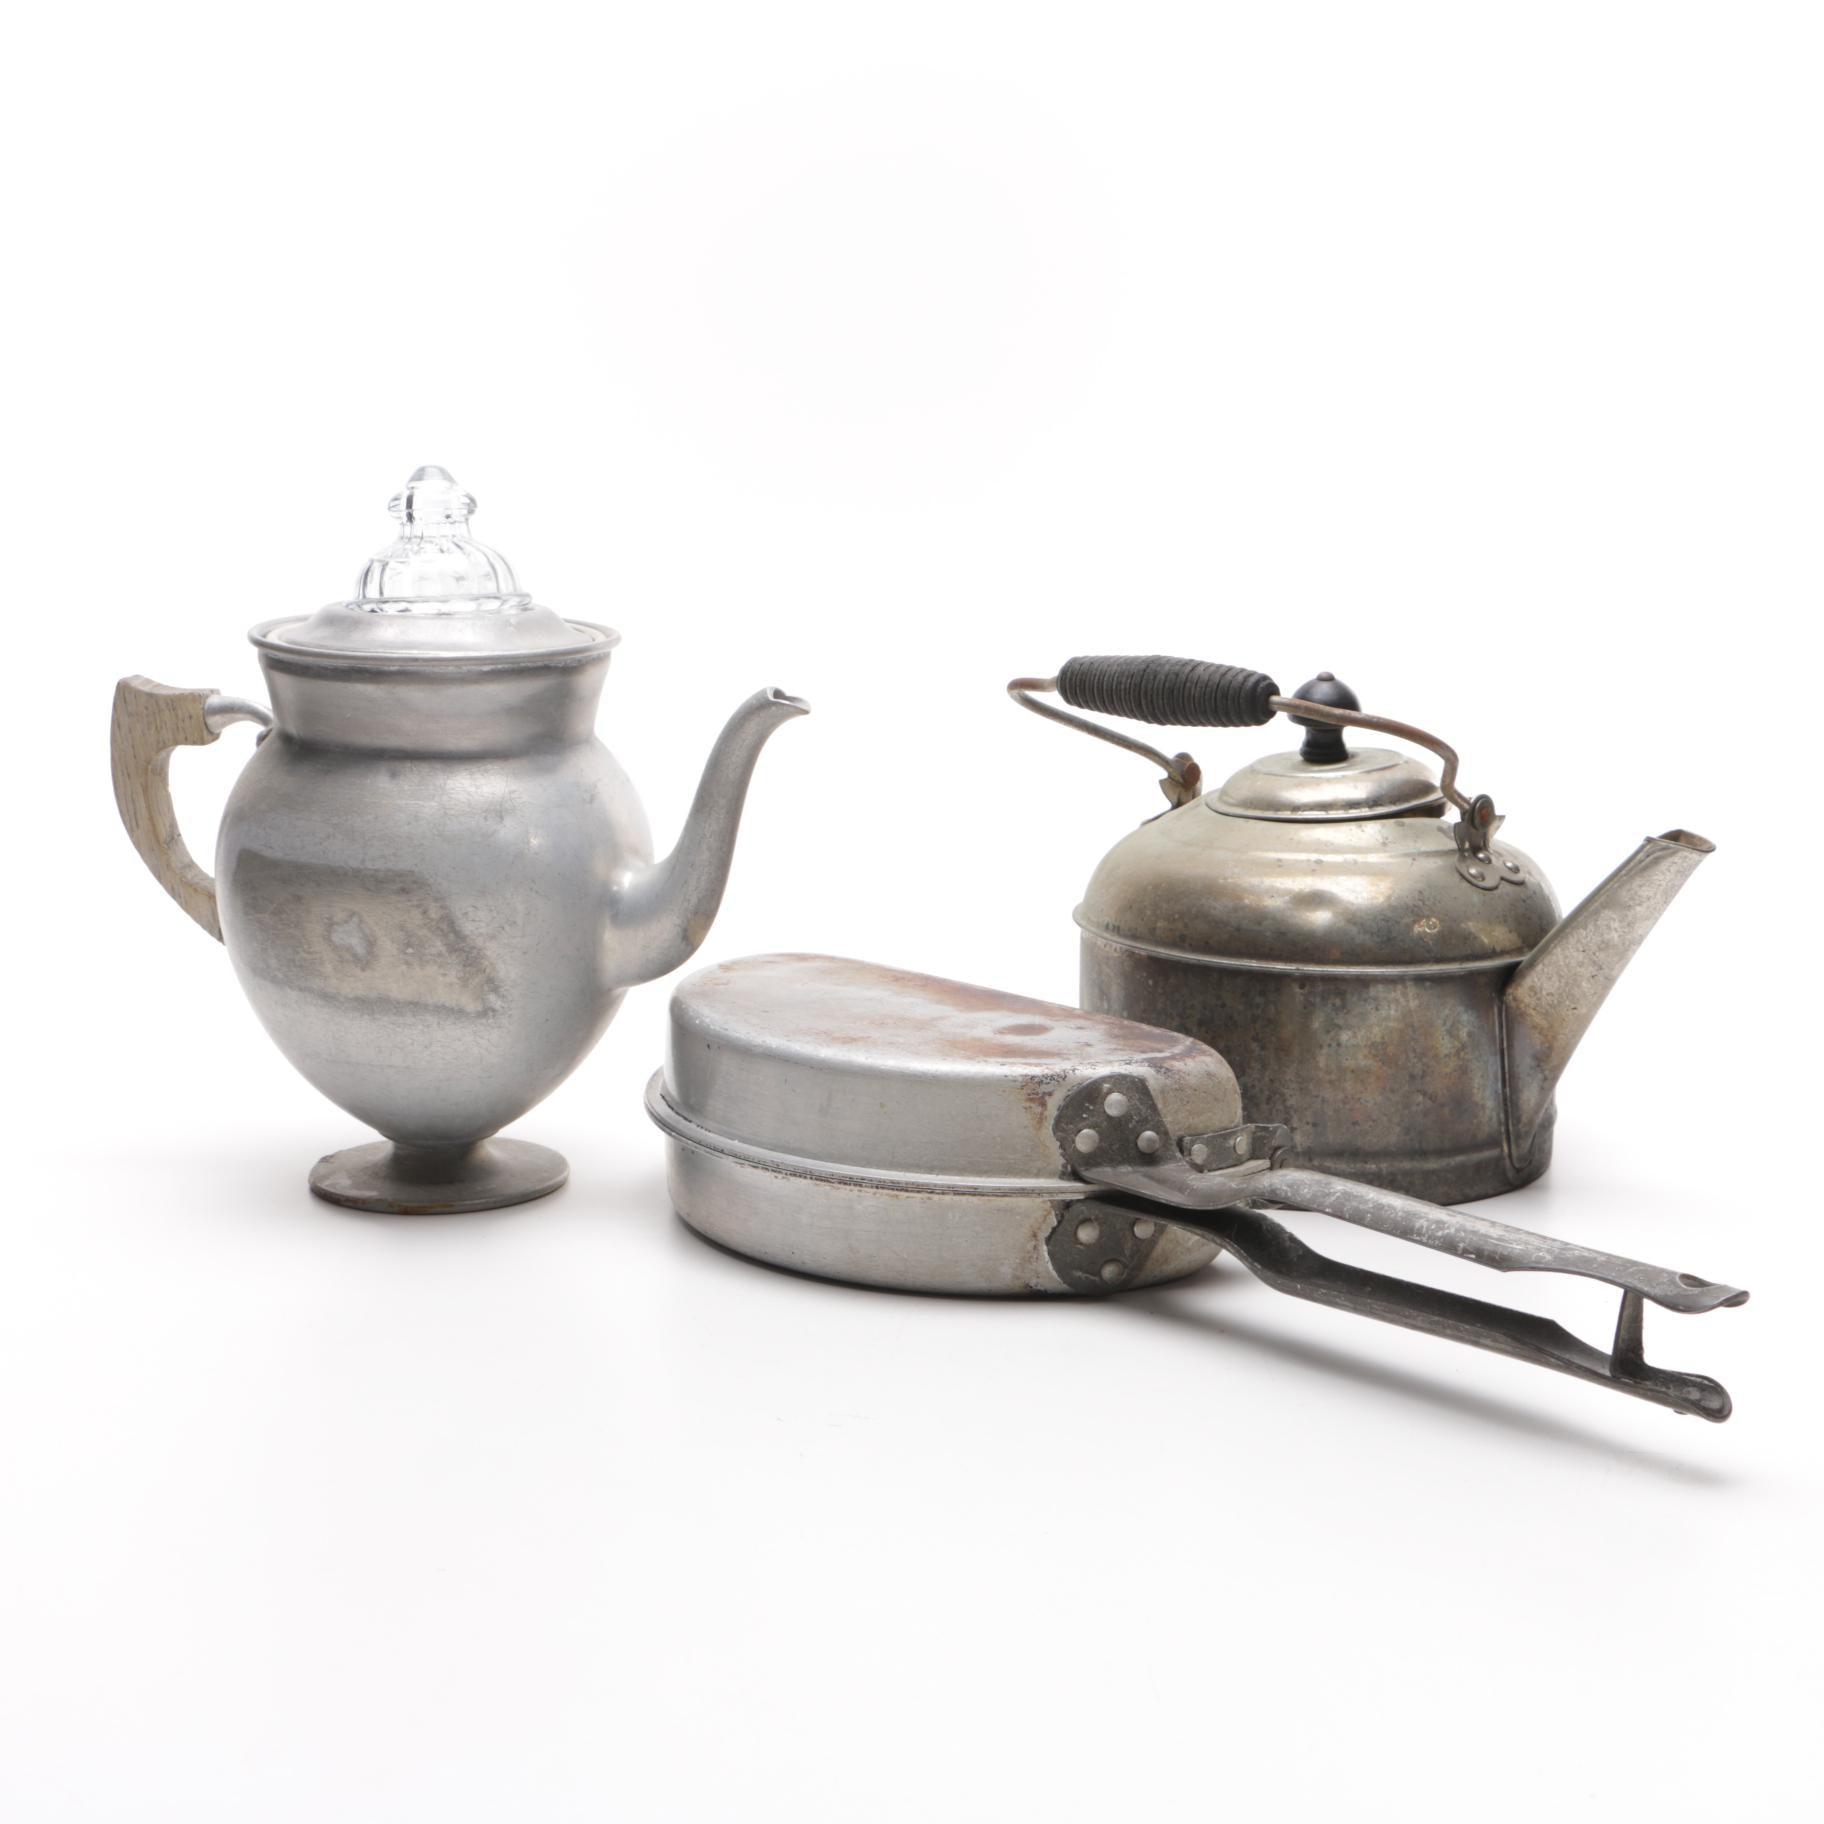 Aluminum Coffee Pot, Kettle, and Omelette Maker